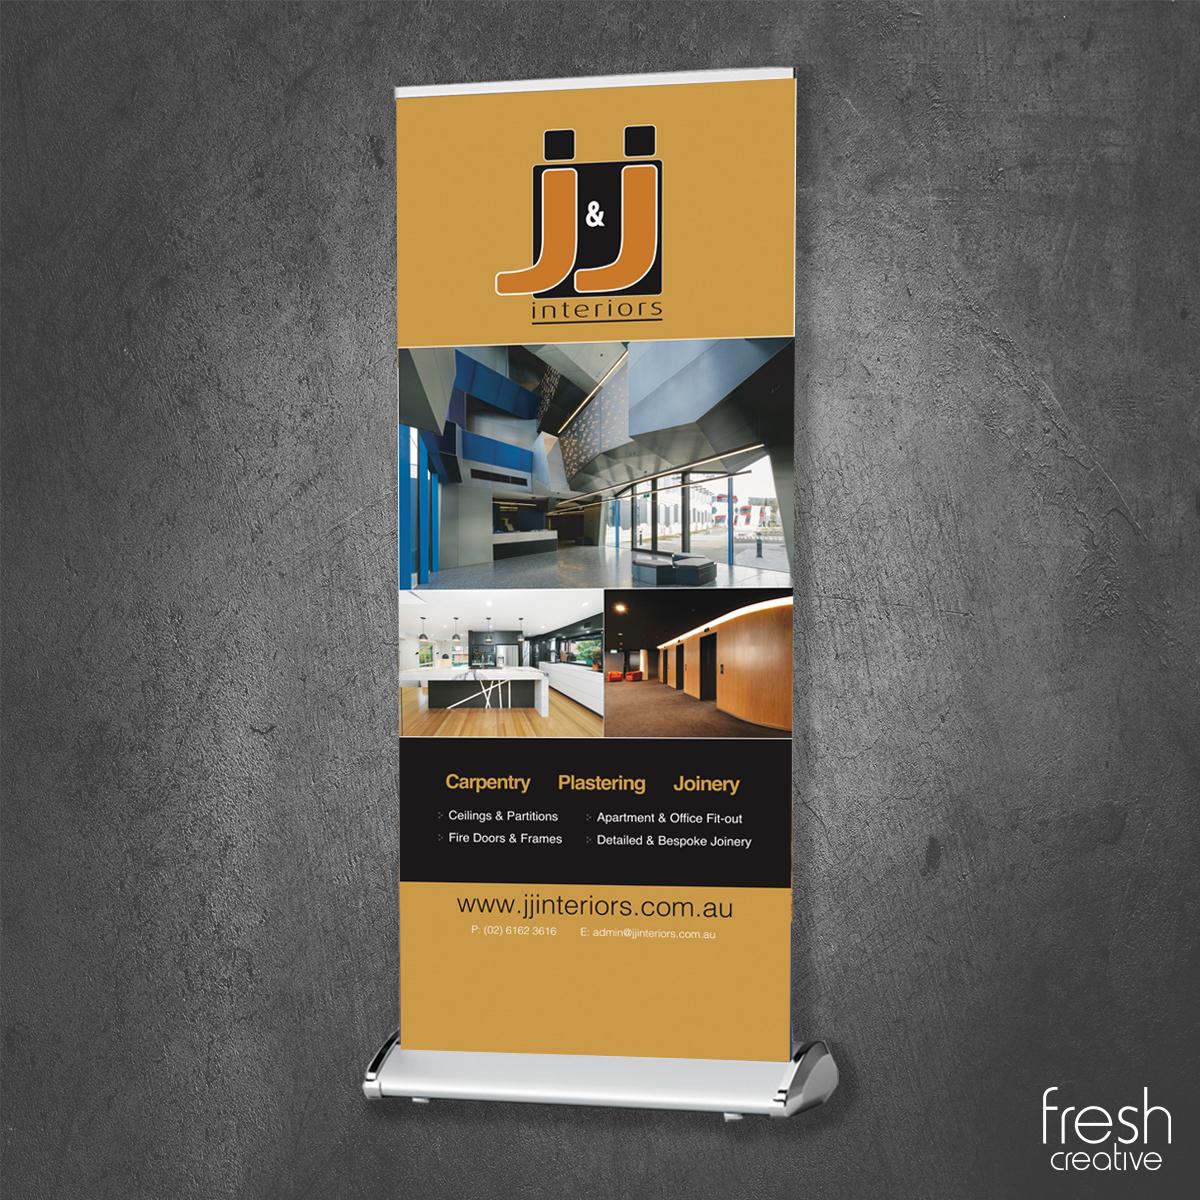 J&J Interiors Pull Up Banner Canberra